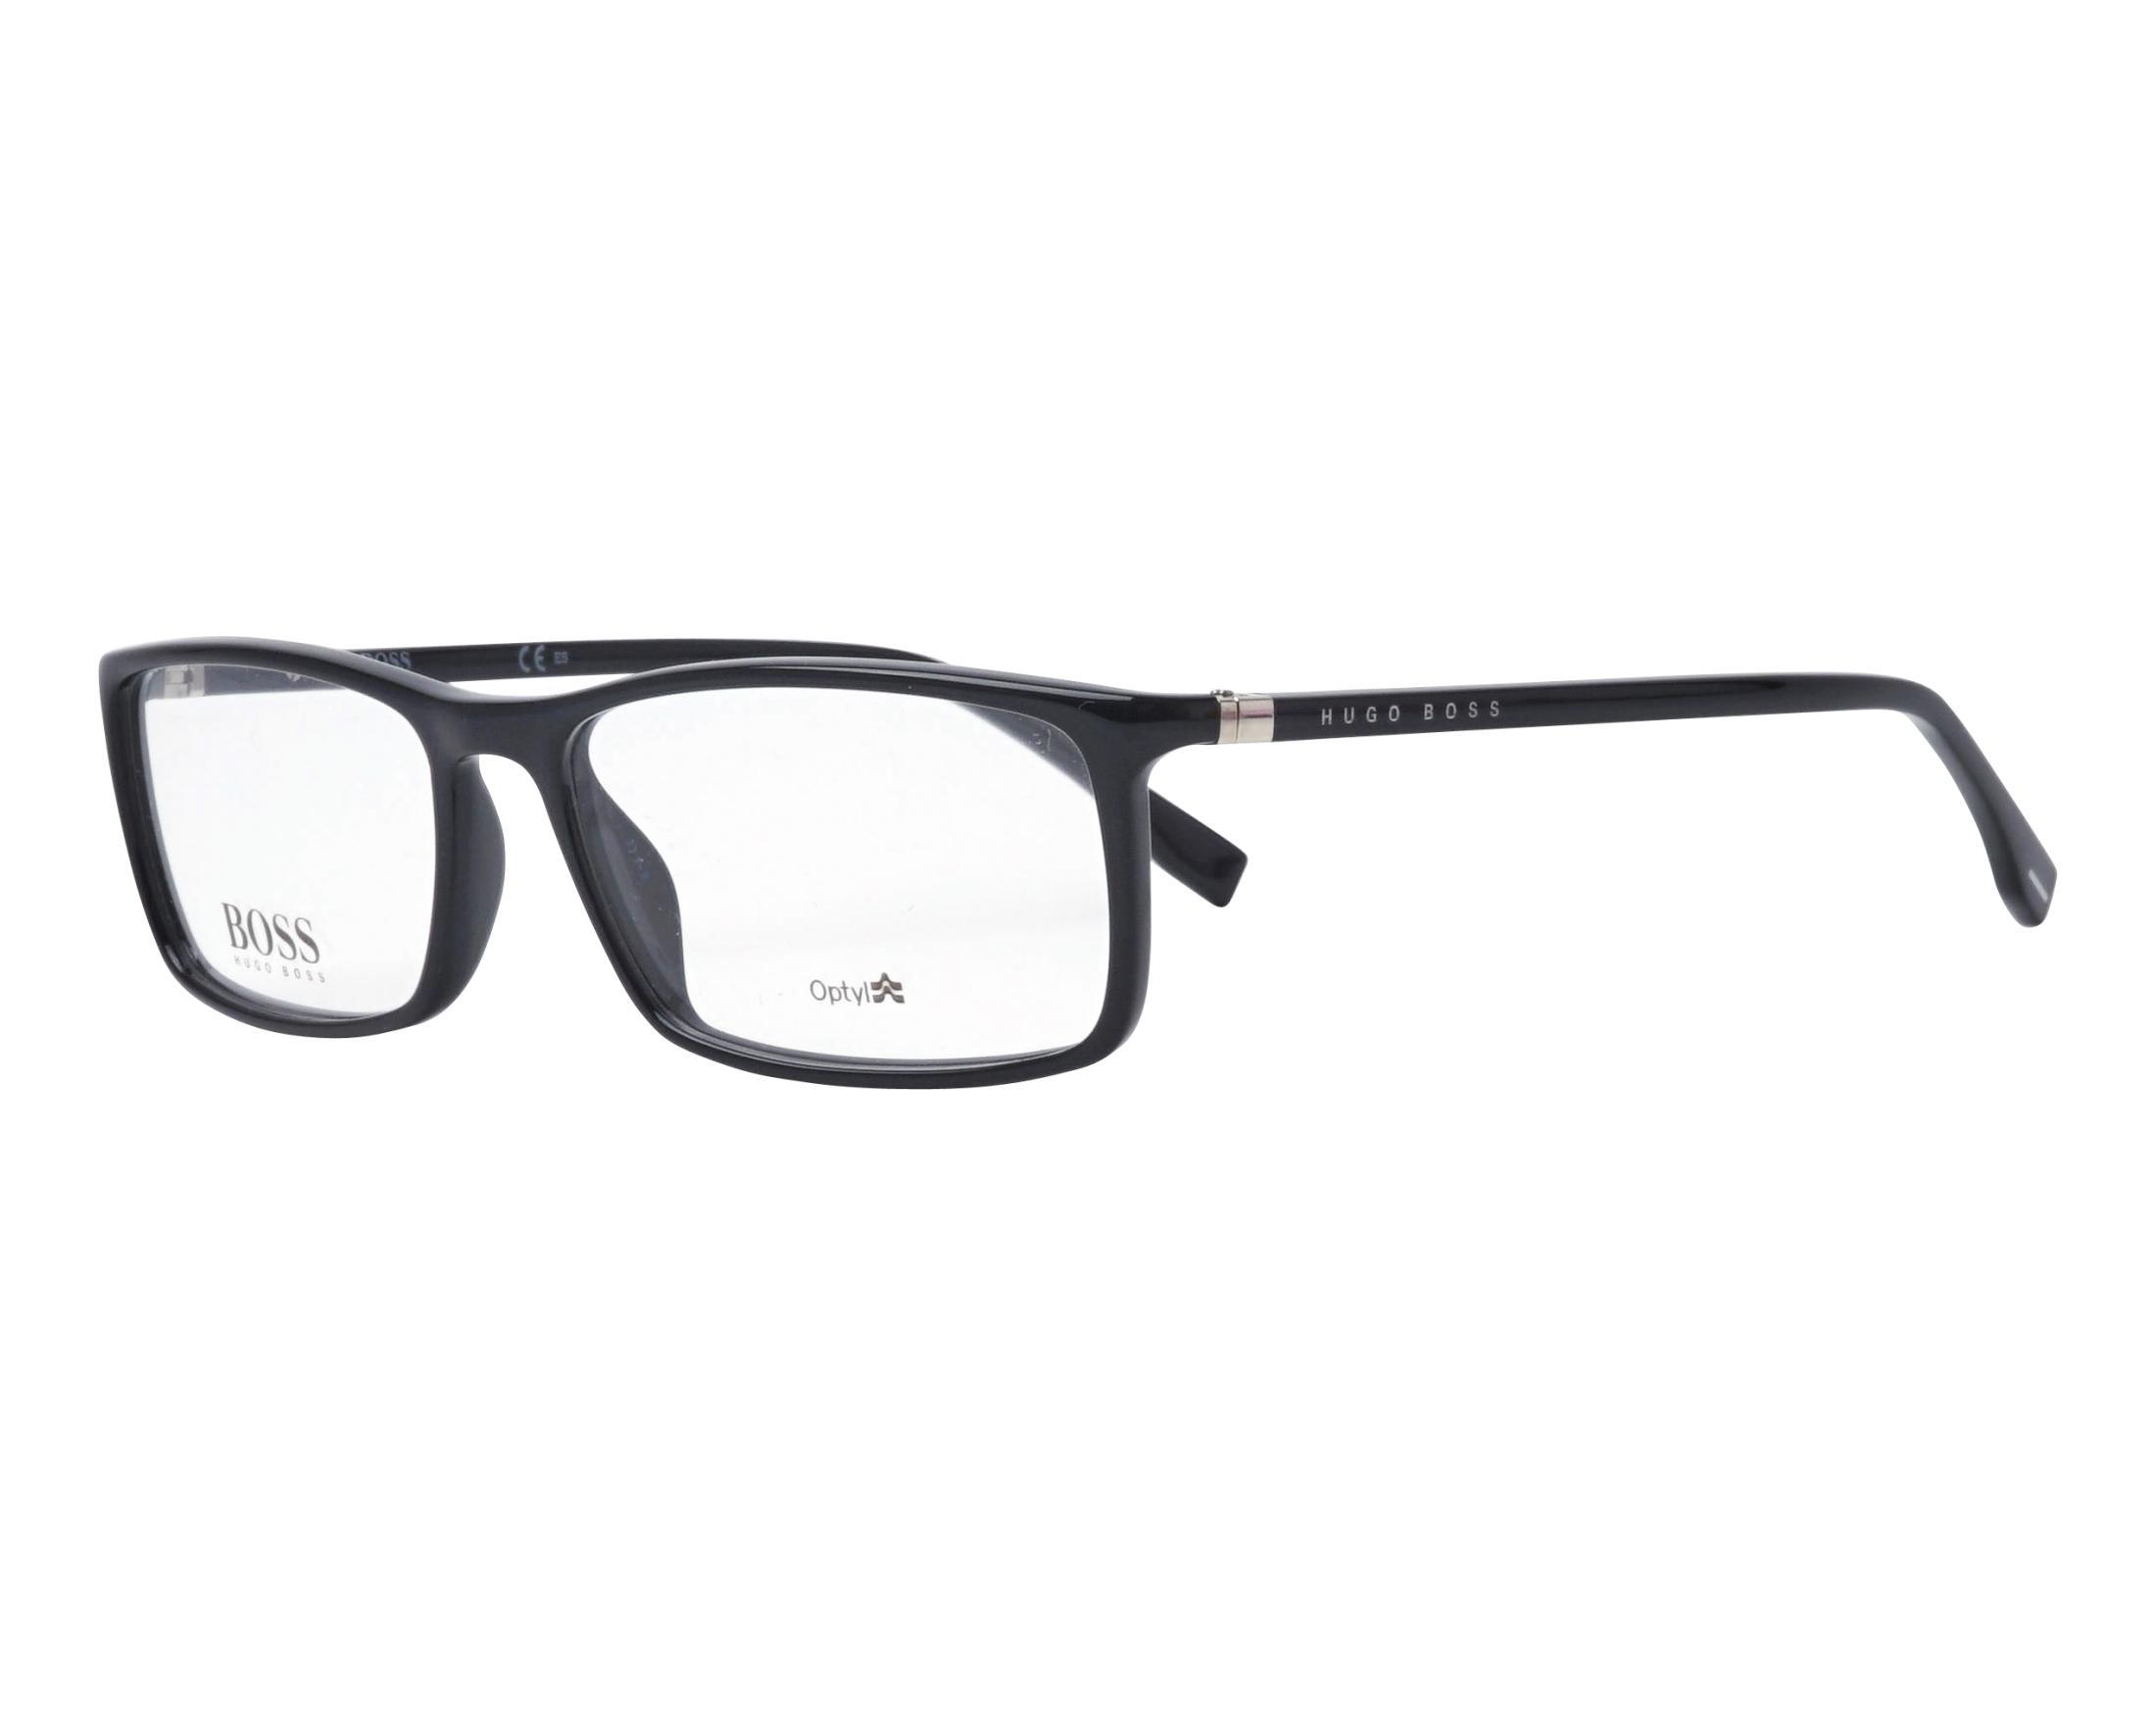 d84697d2c Gafas Graduadas Hugo Boss BOSS-0680 807 55-16 Negra vista de perfil